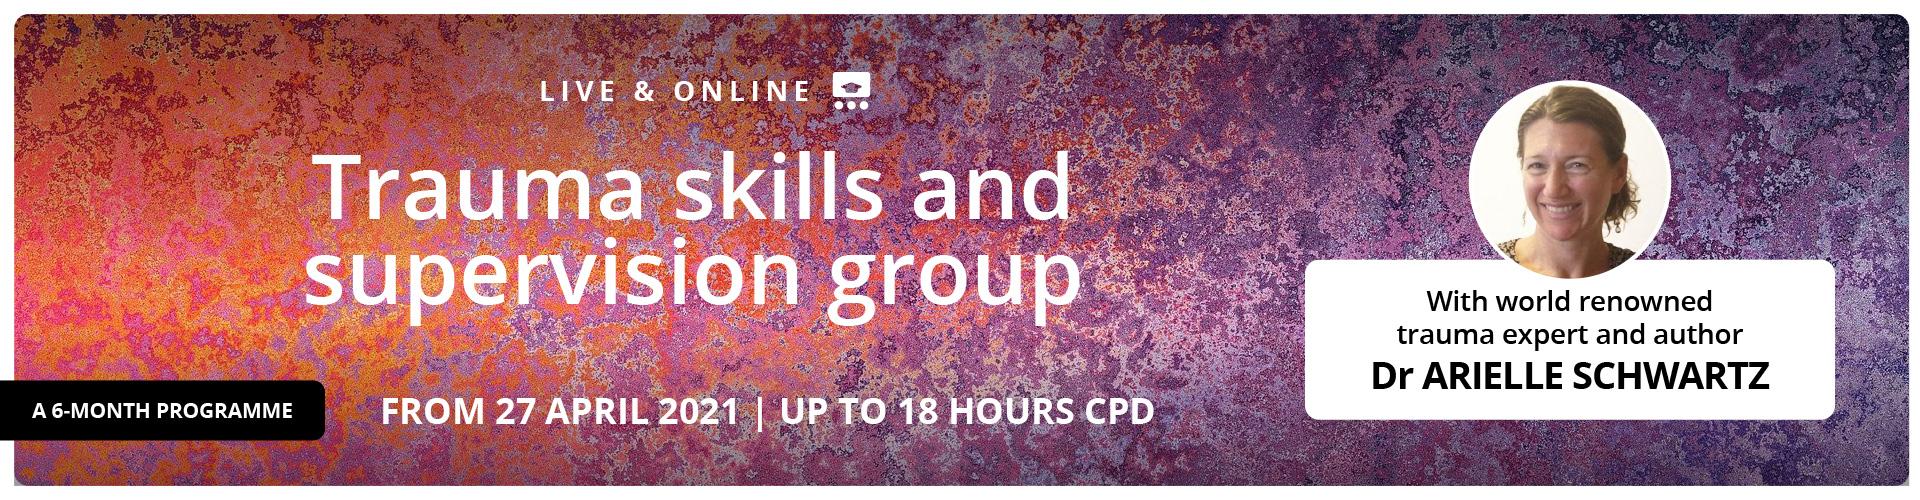 Trauma skills and supervision group